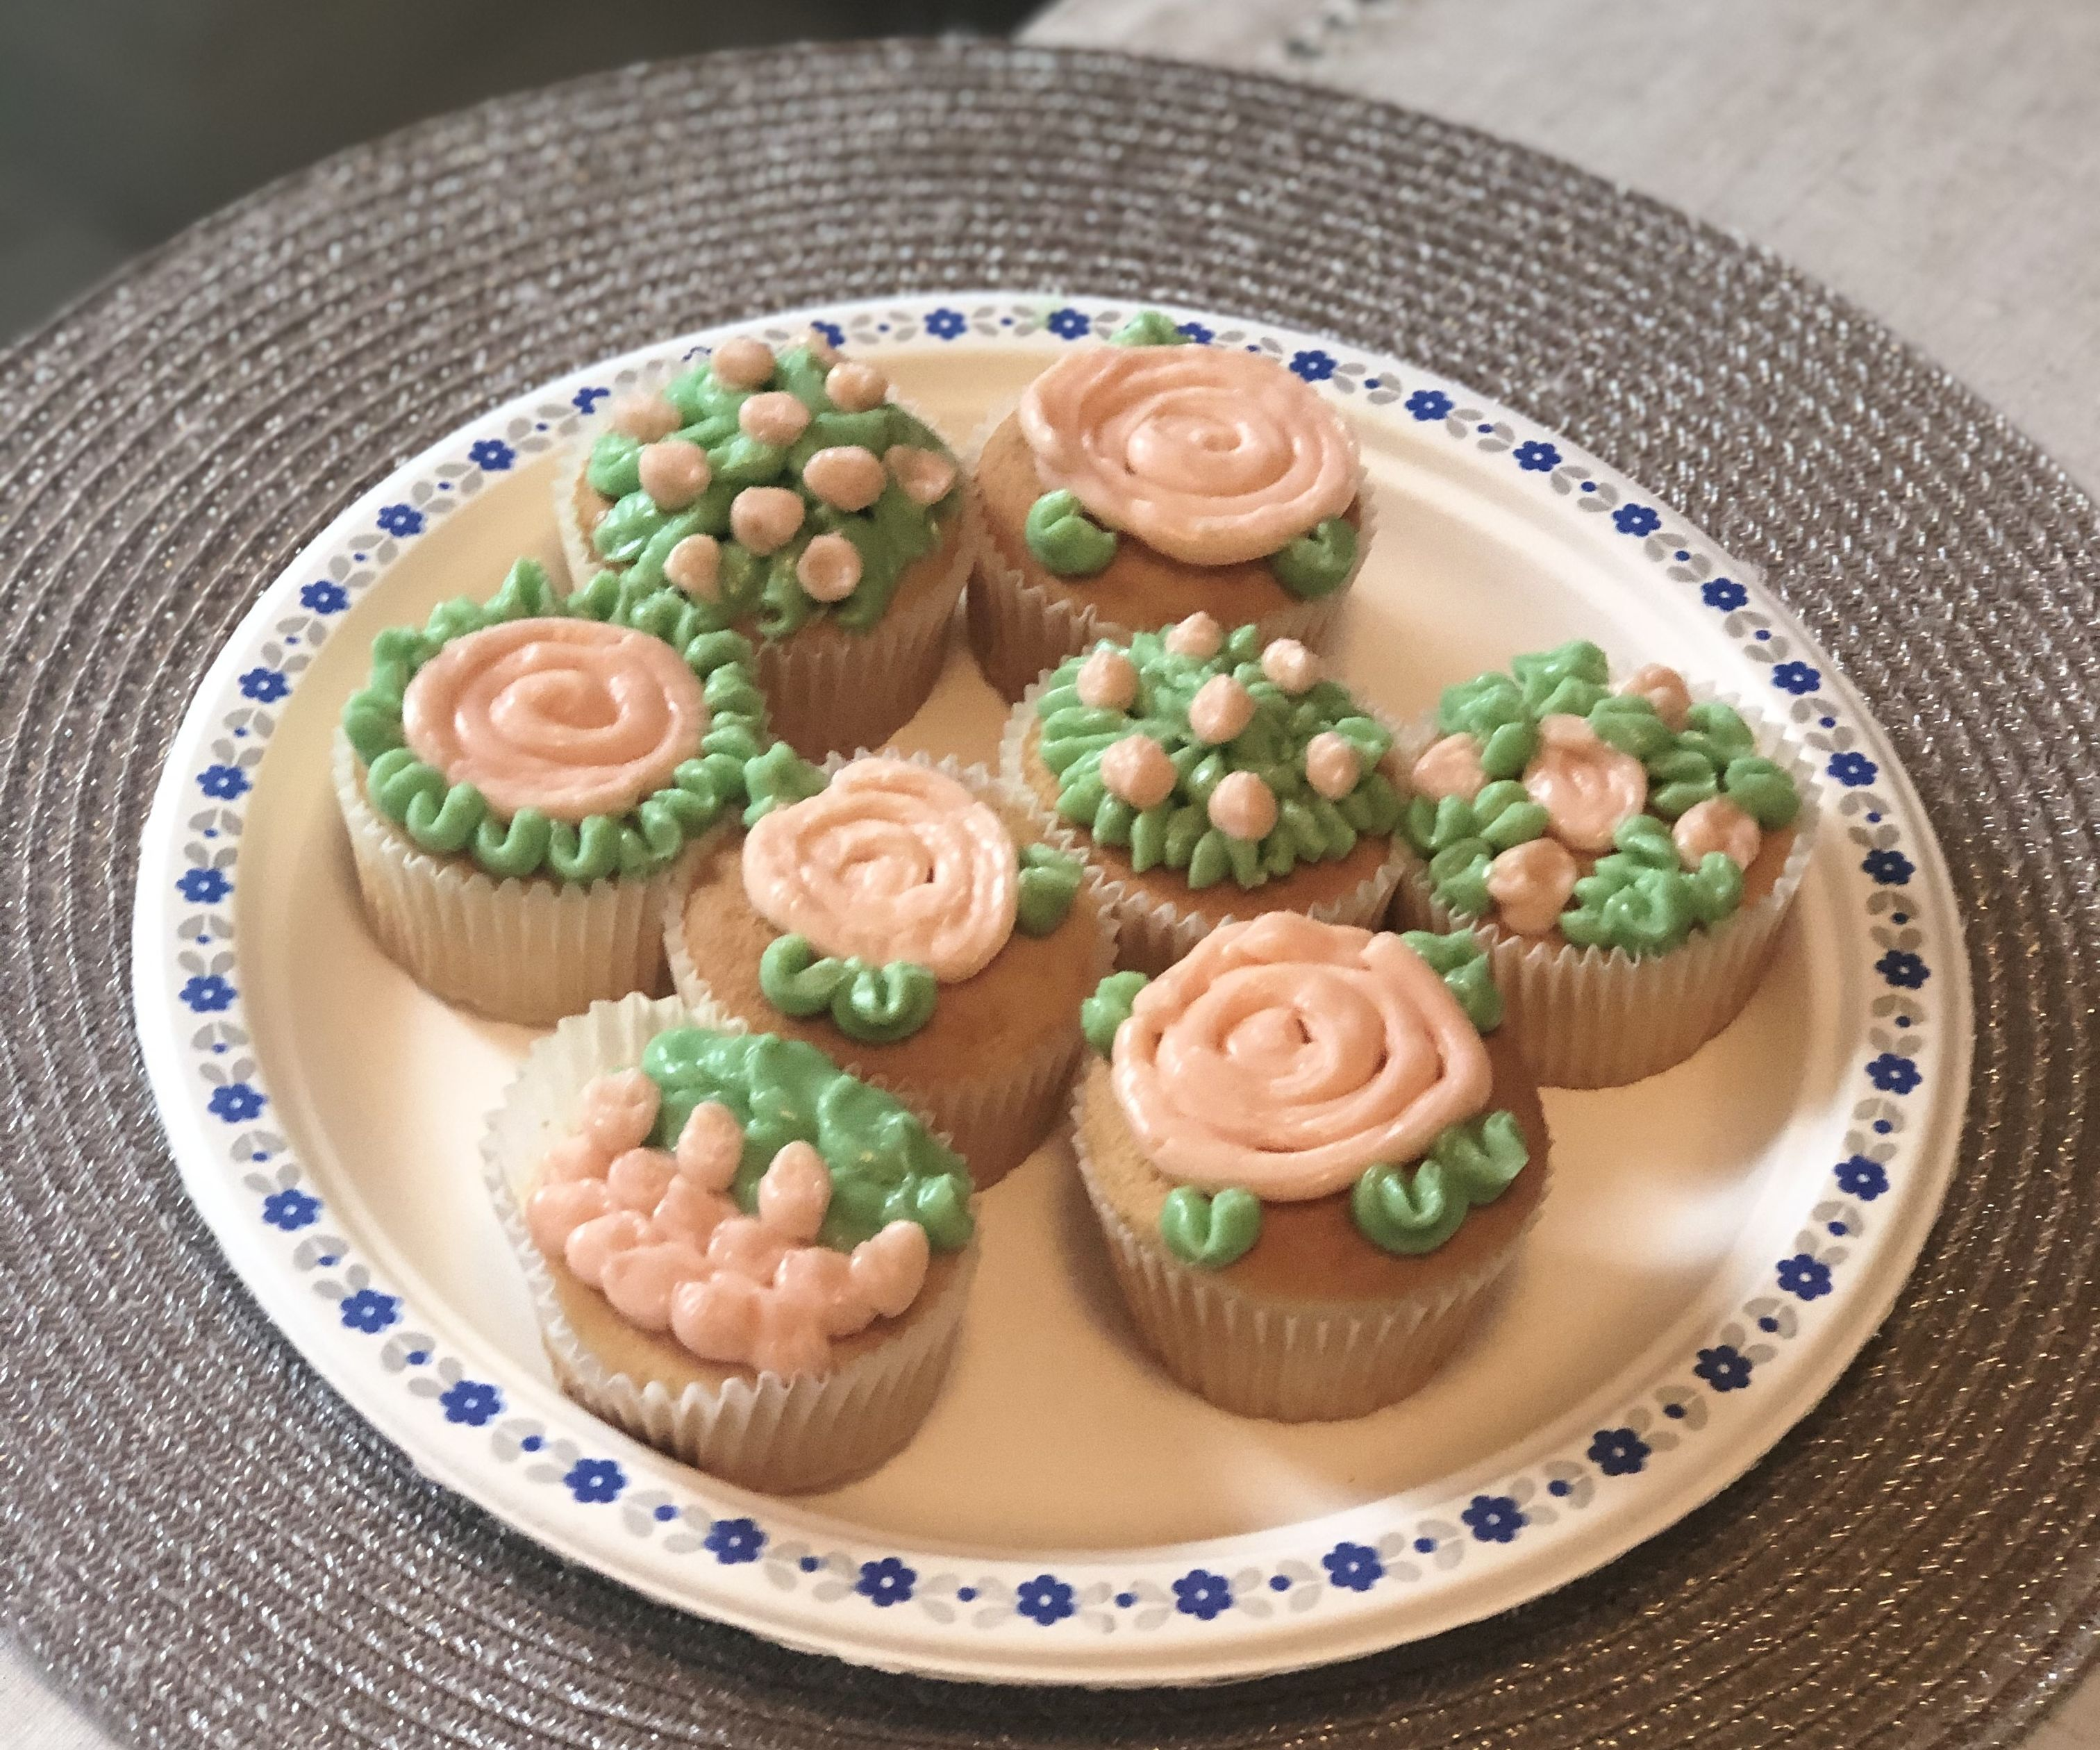 Cupcakes With Swiss Meringue Buttercream